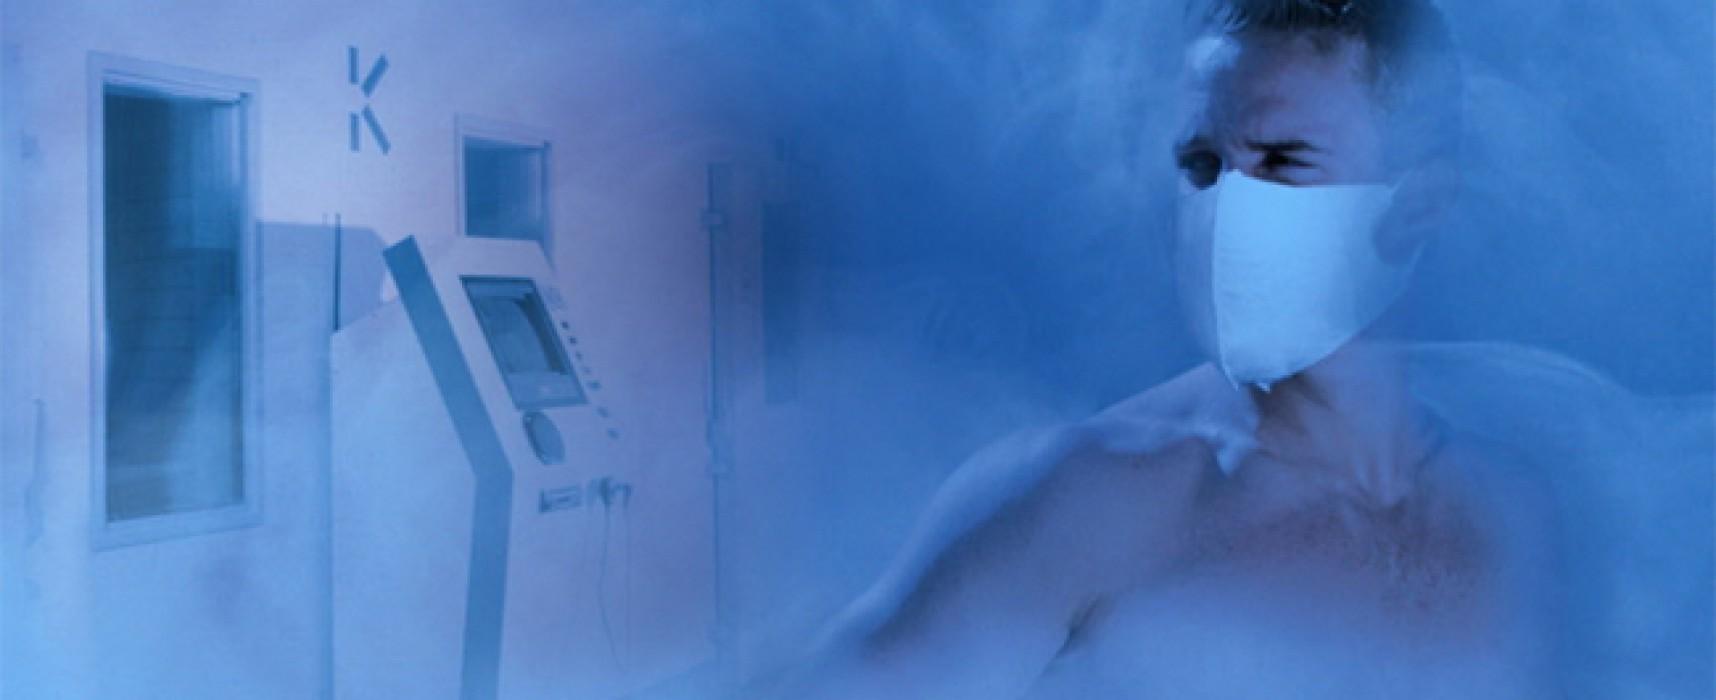 Криотерапия — когда полезен холод?